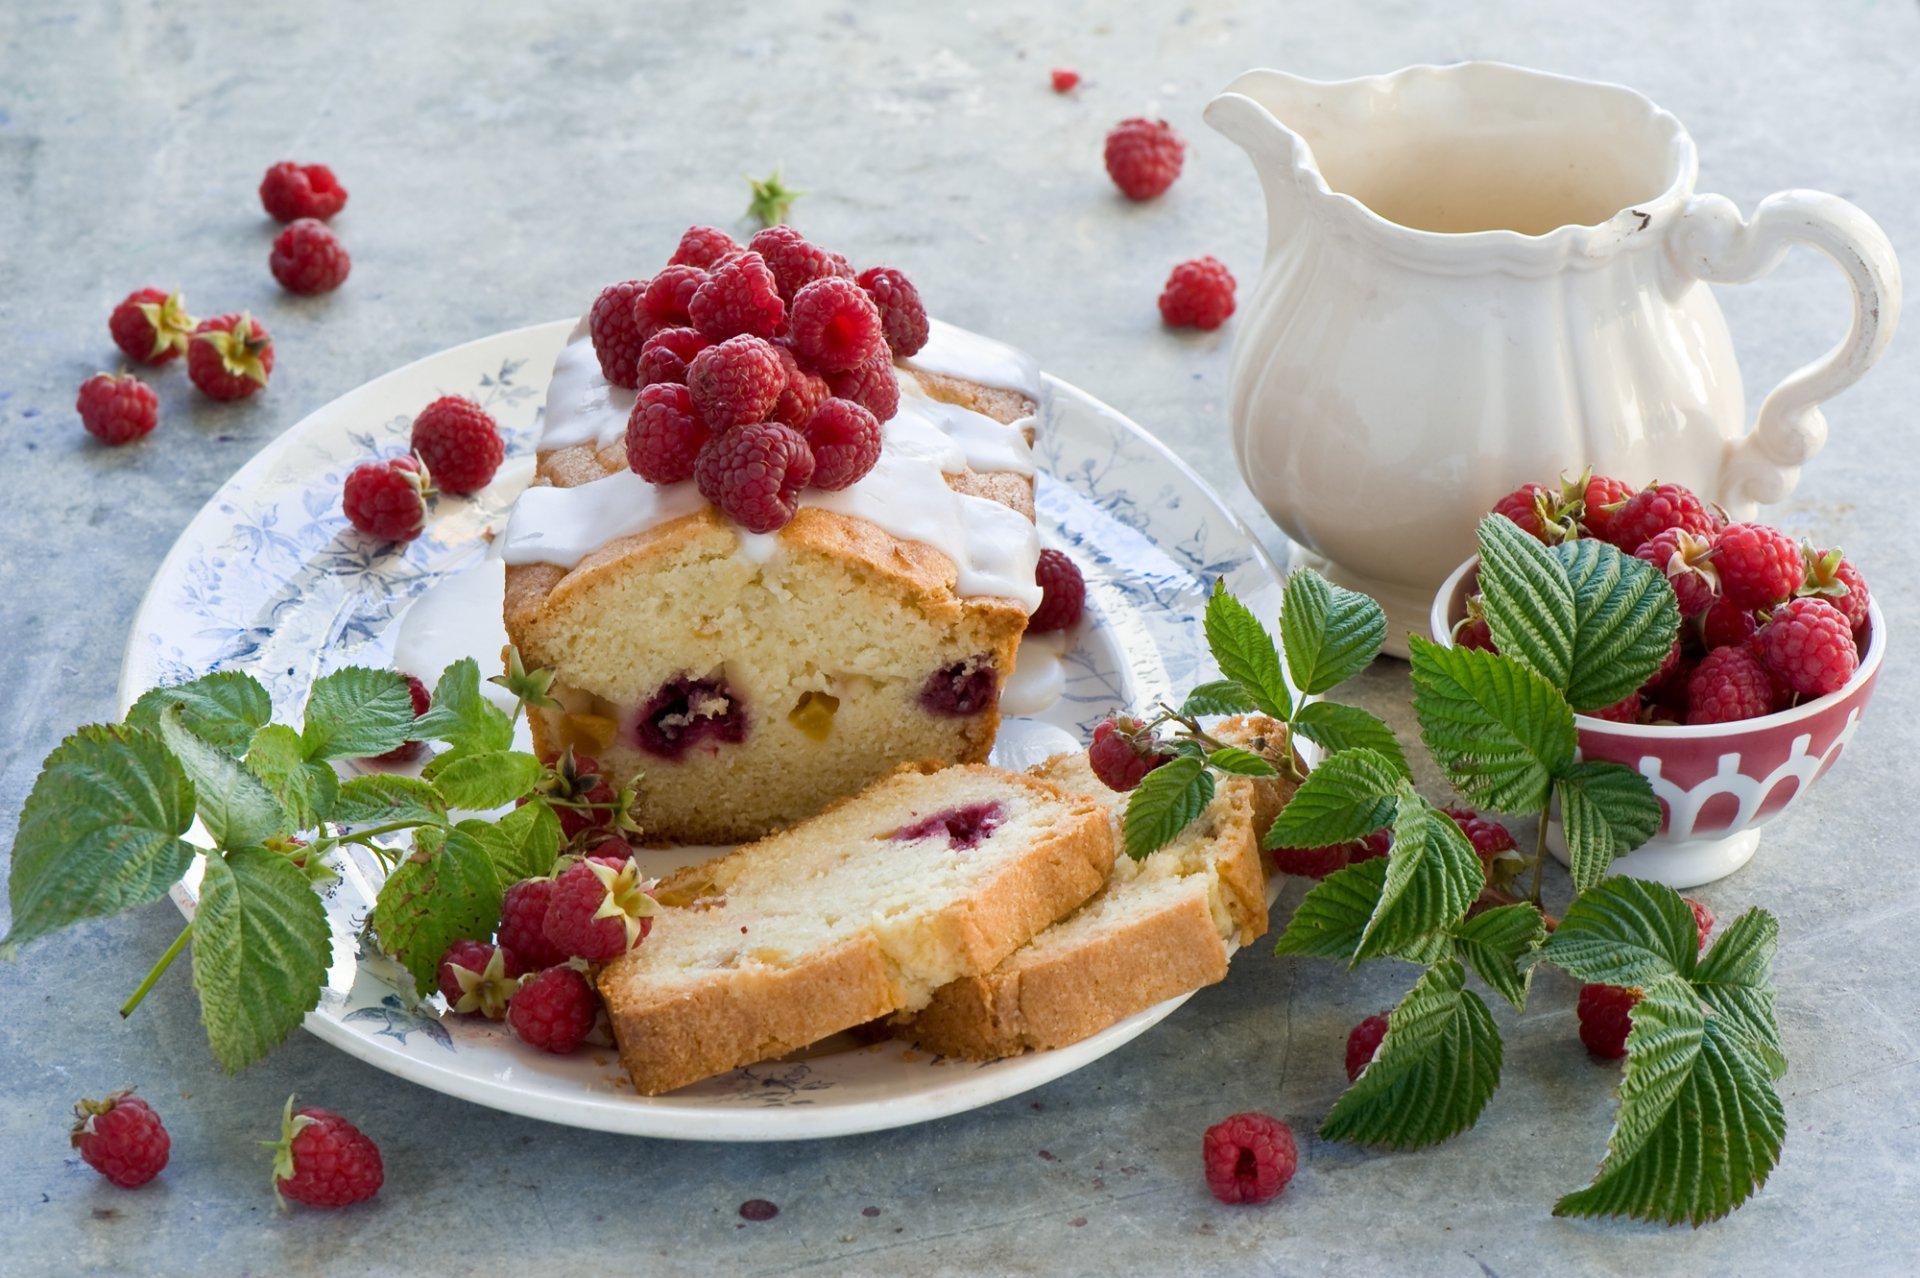 Food - Cake  Berry Pastry Raspberry Wallpaper